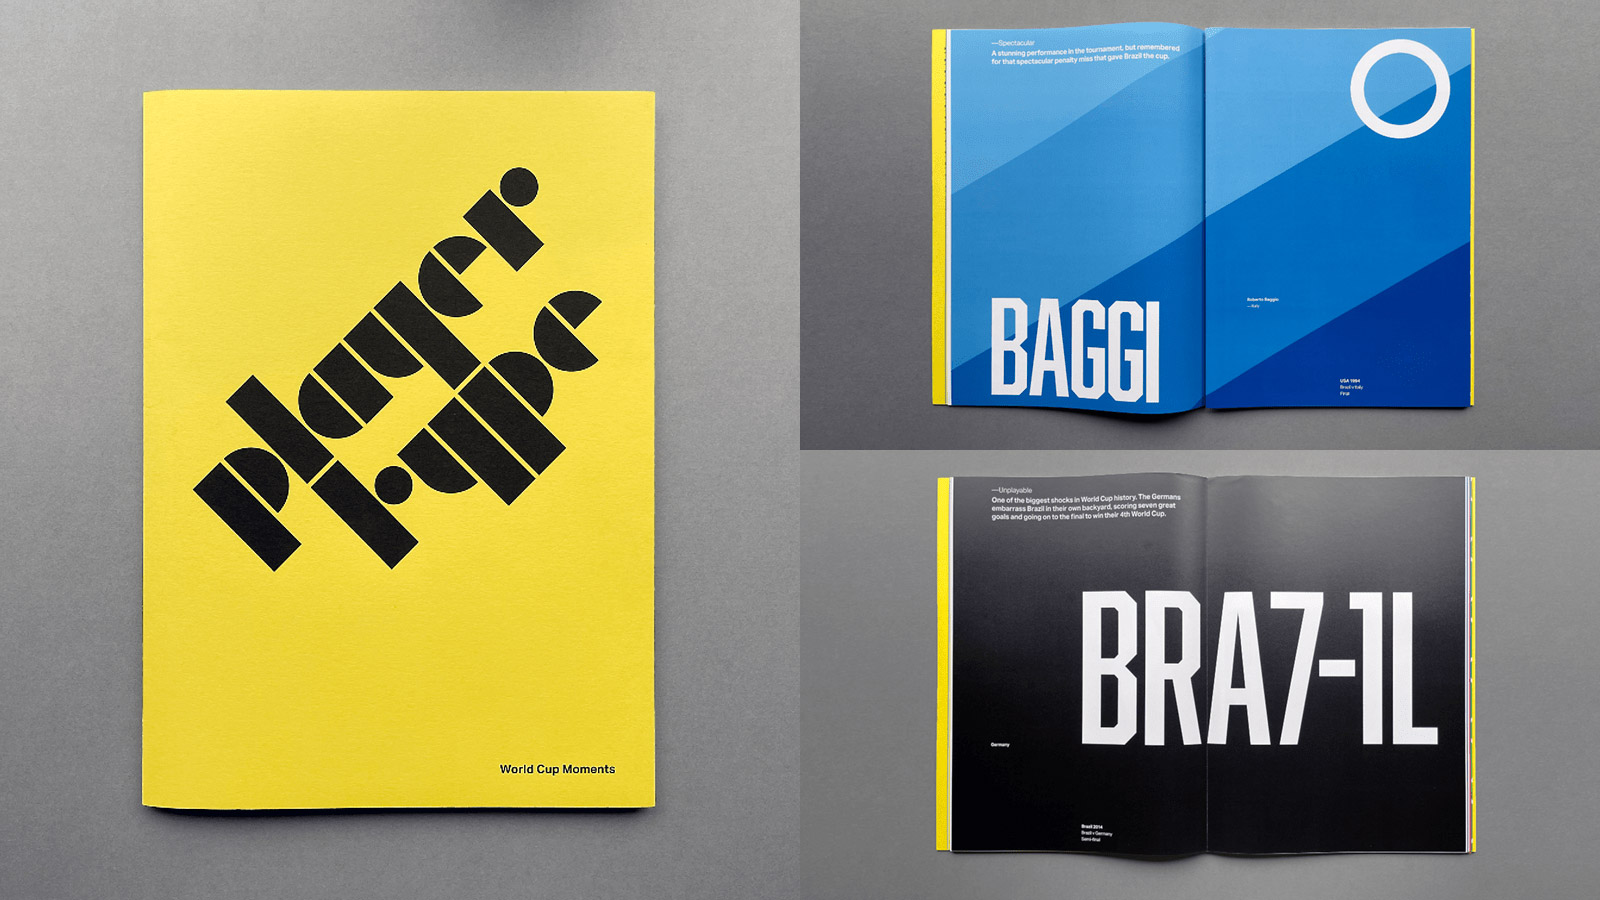 branding-identity-design-sport-football-graphics-dinkit-artwork-prints-posters-gallery-milton-keynes-london-12